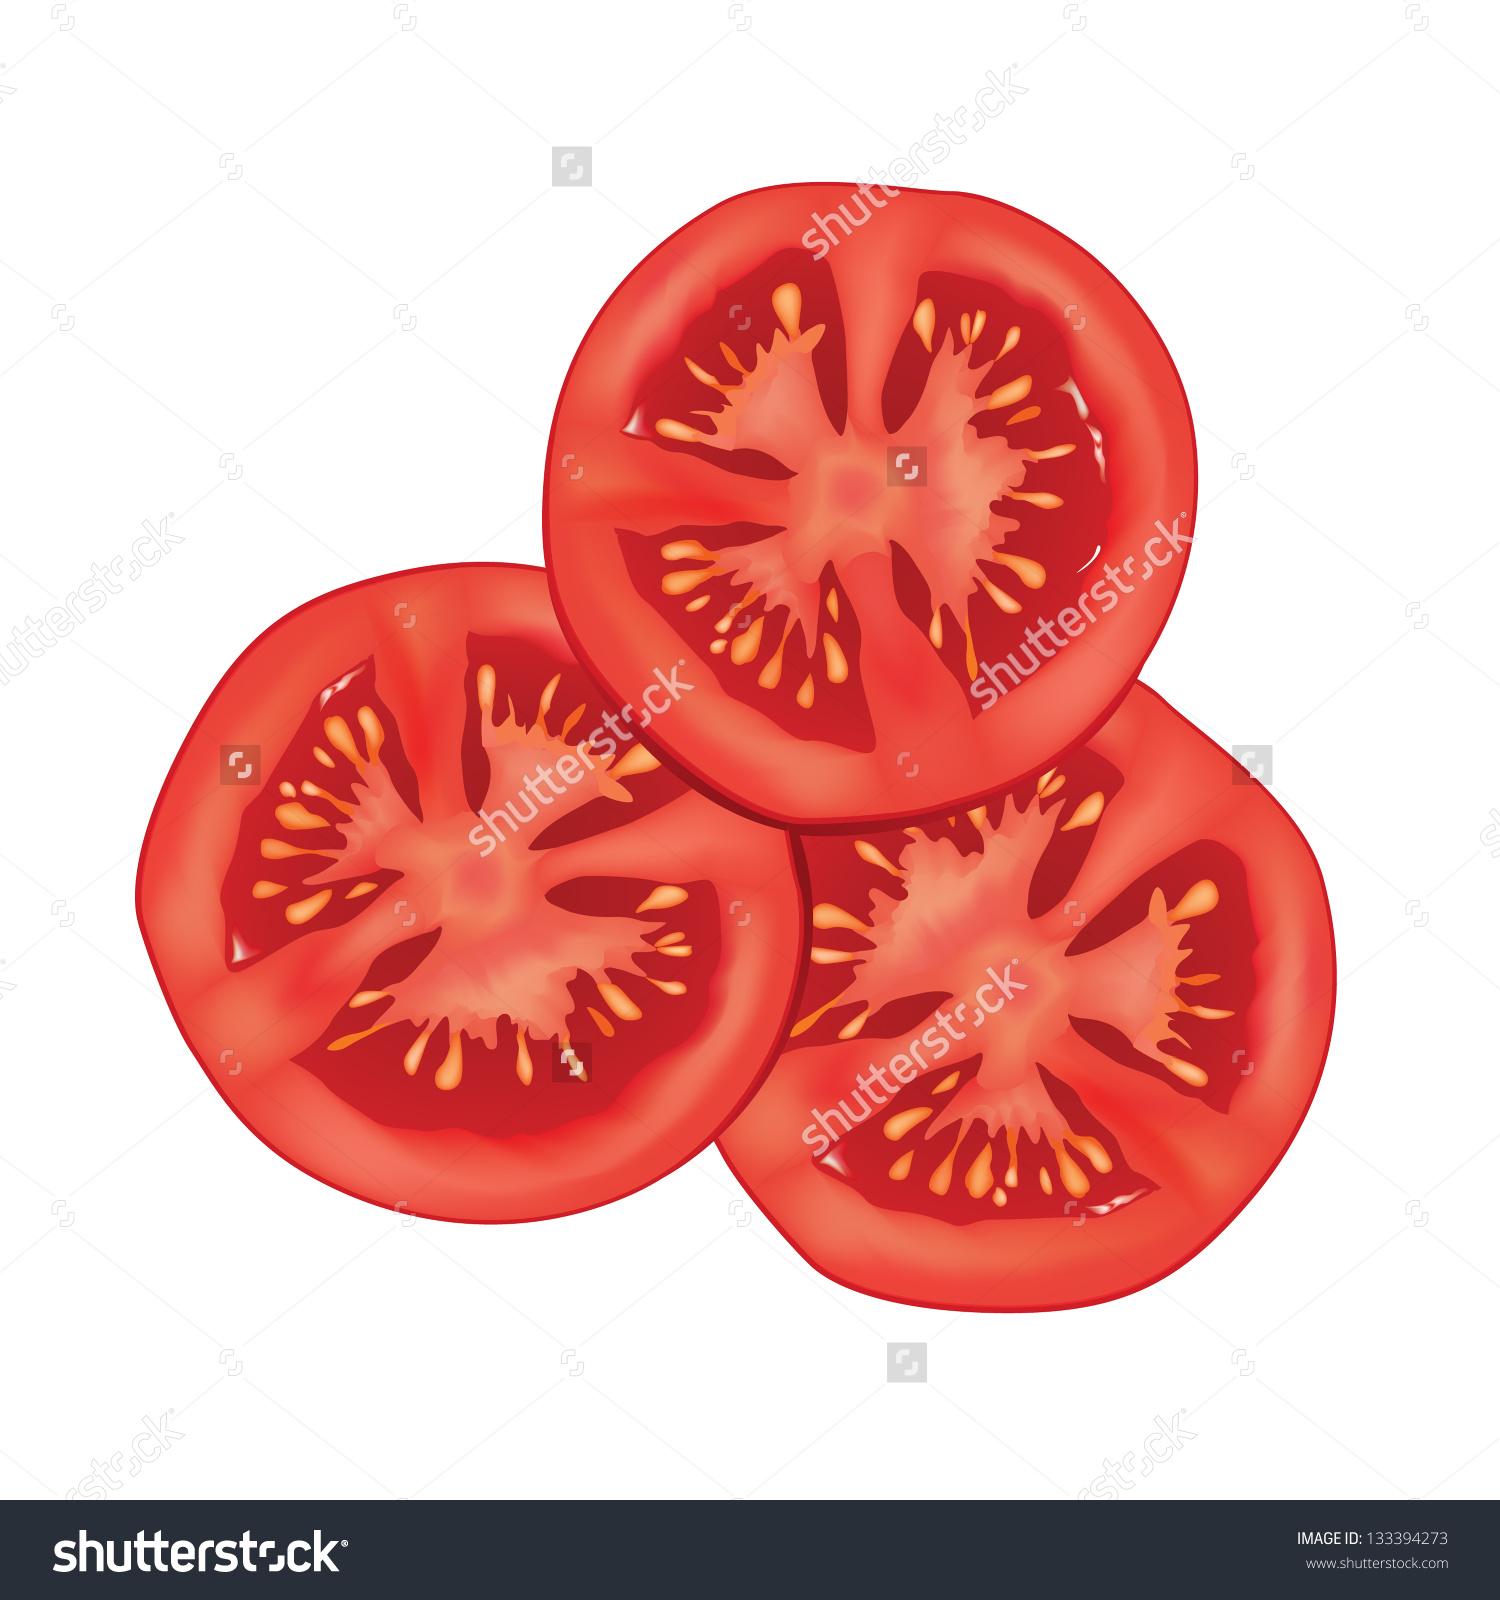 1500x1600 Sliced Tomato Isolated Over White Background. Vector Illustration